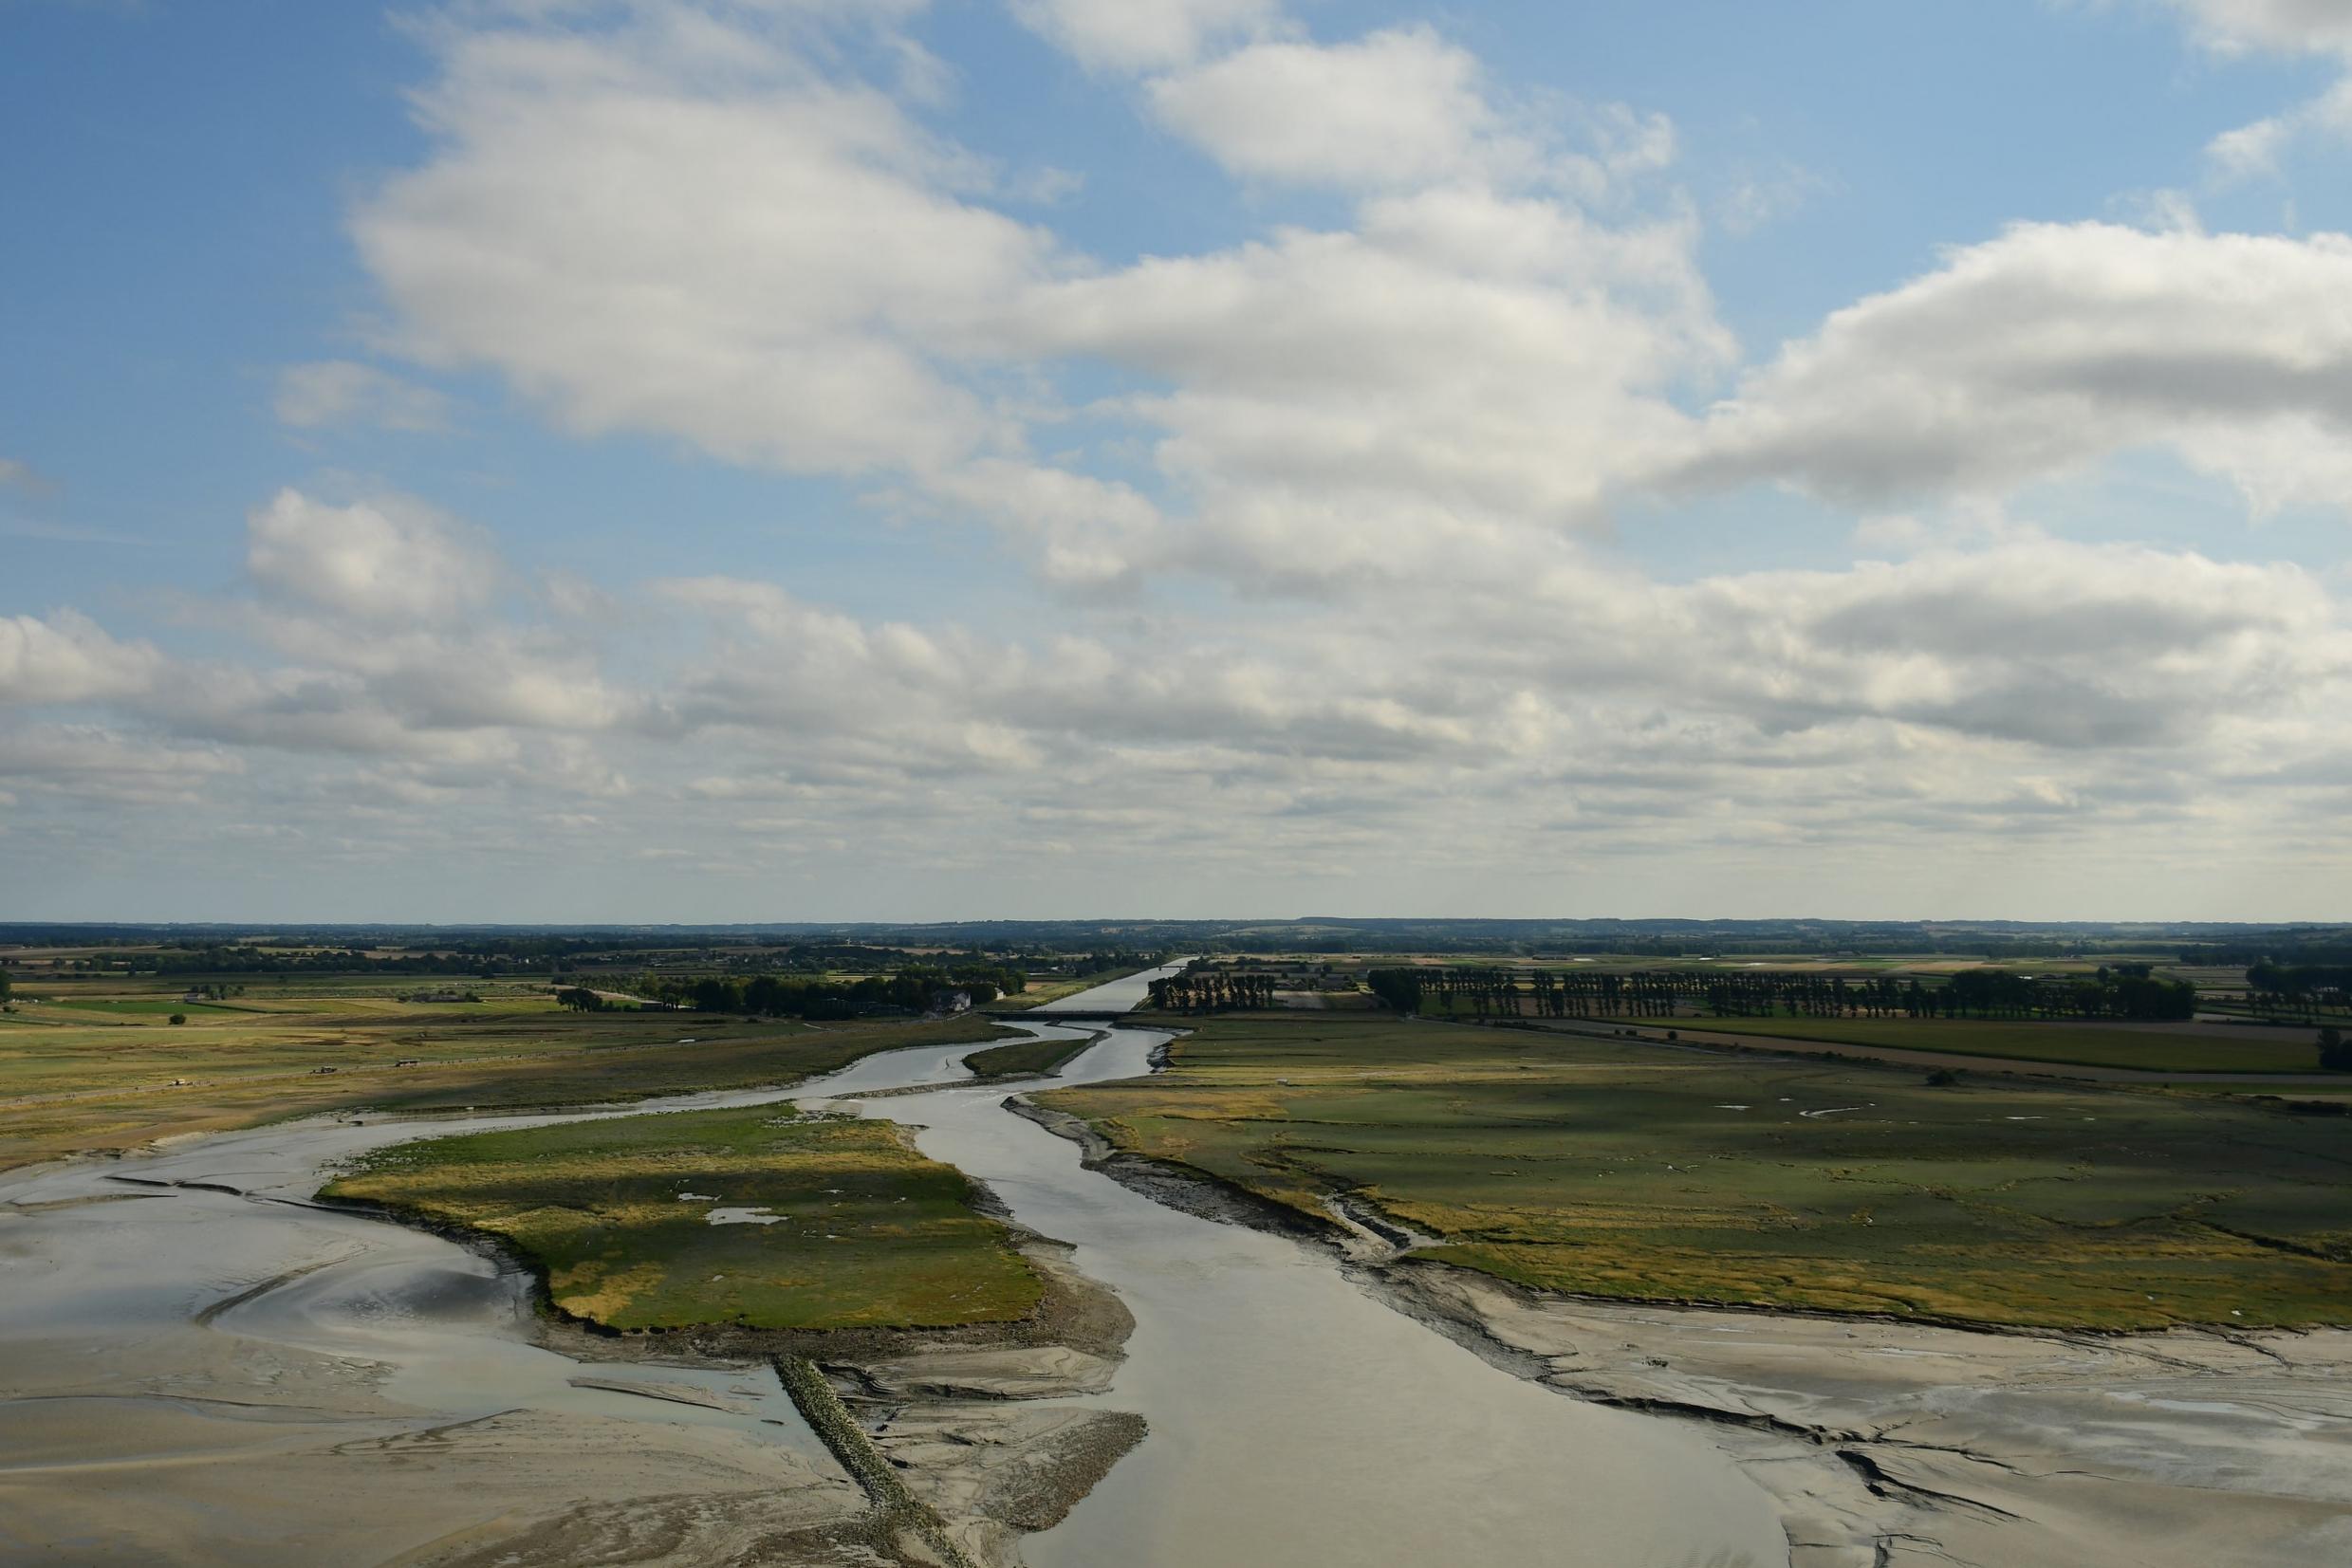 view from le mont saint michel, normandy